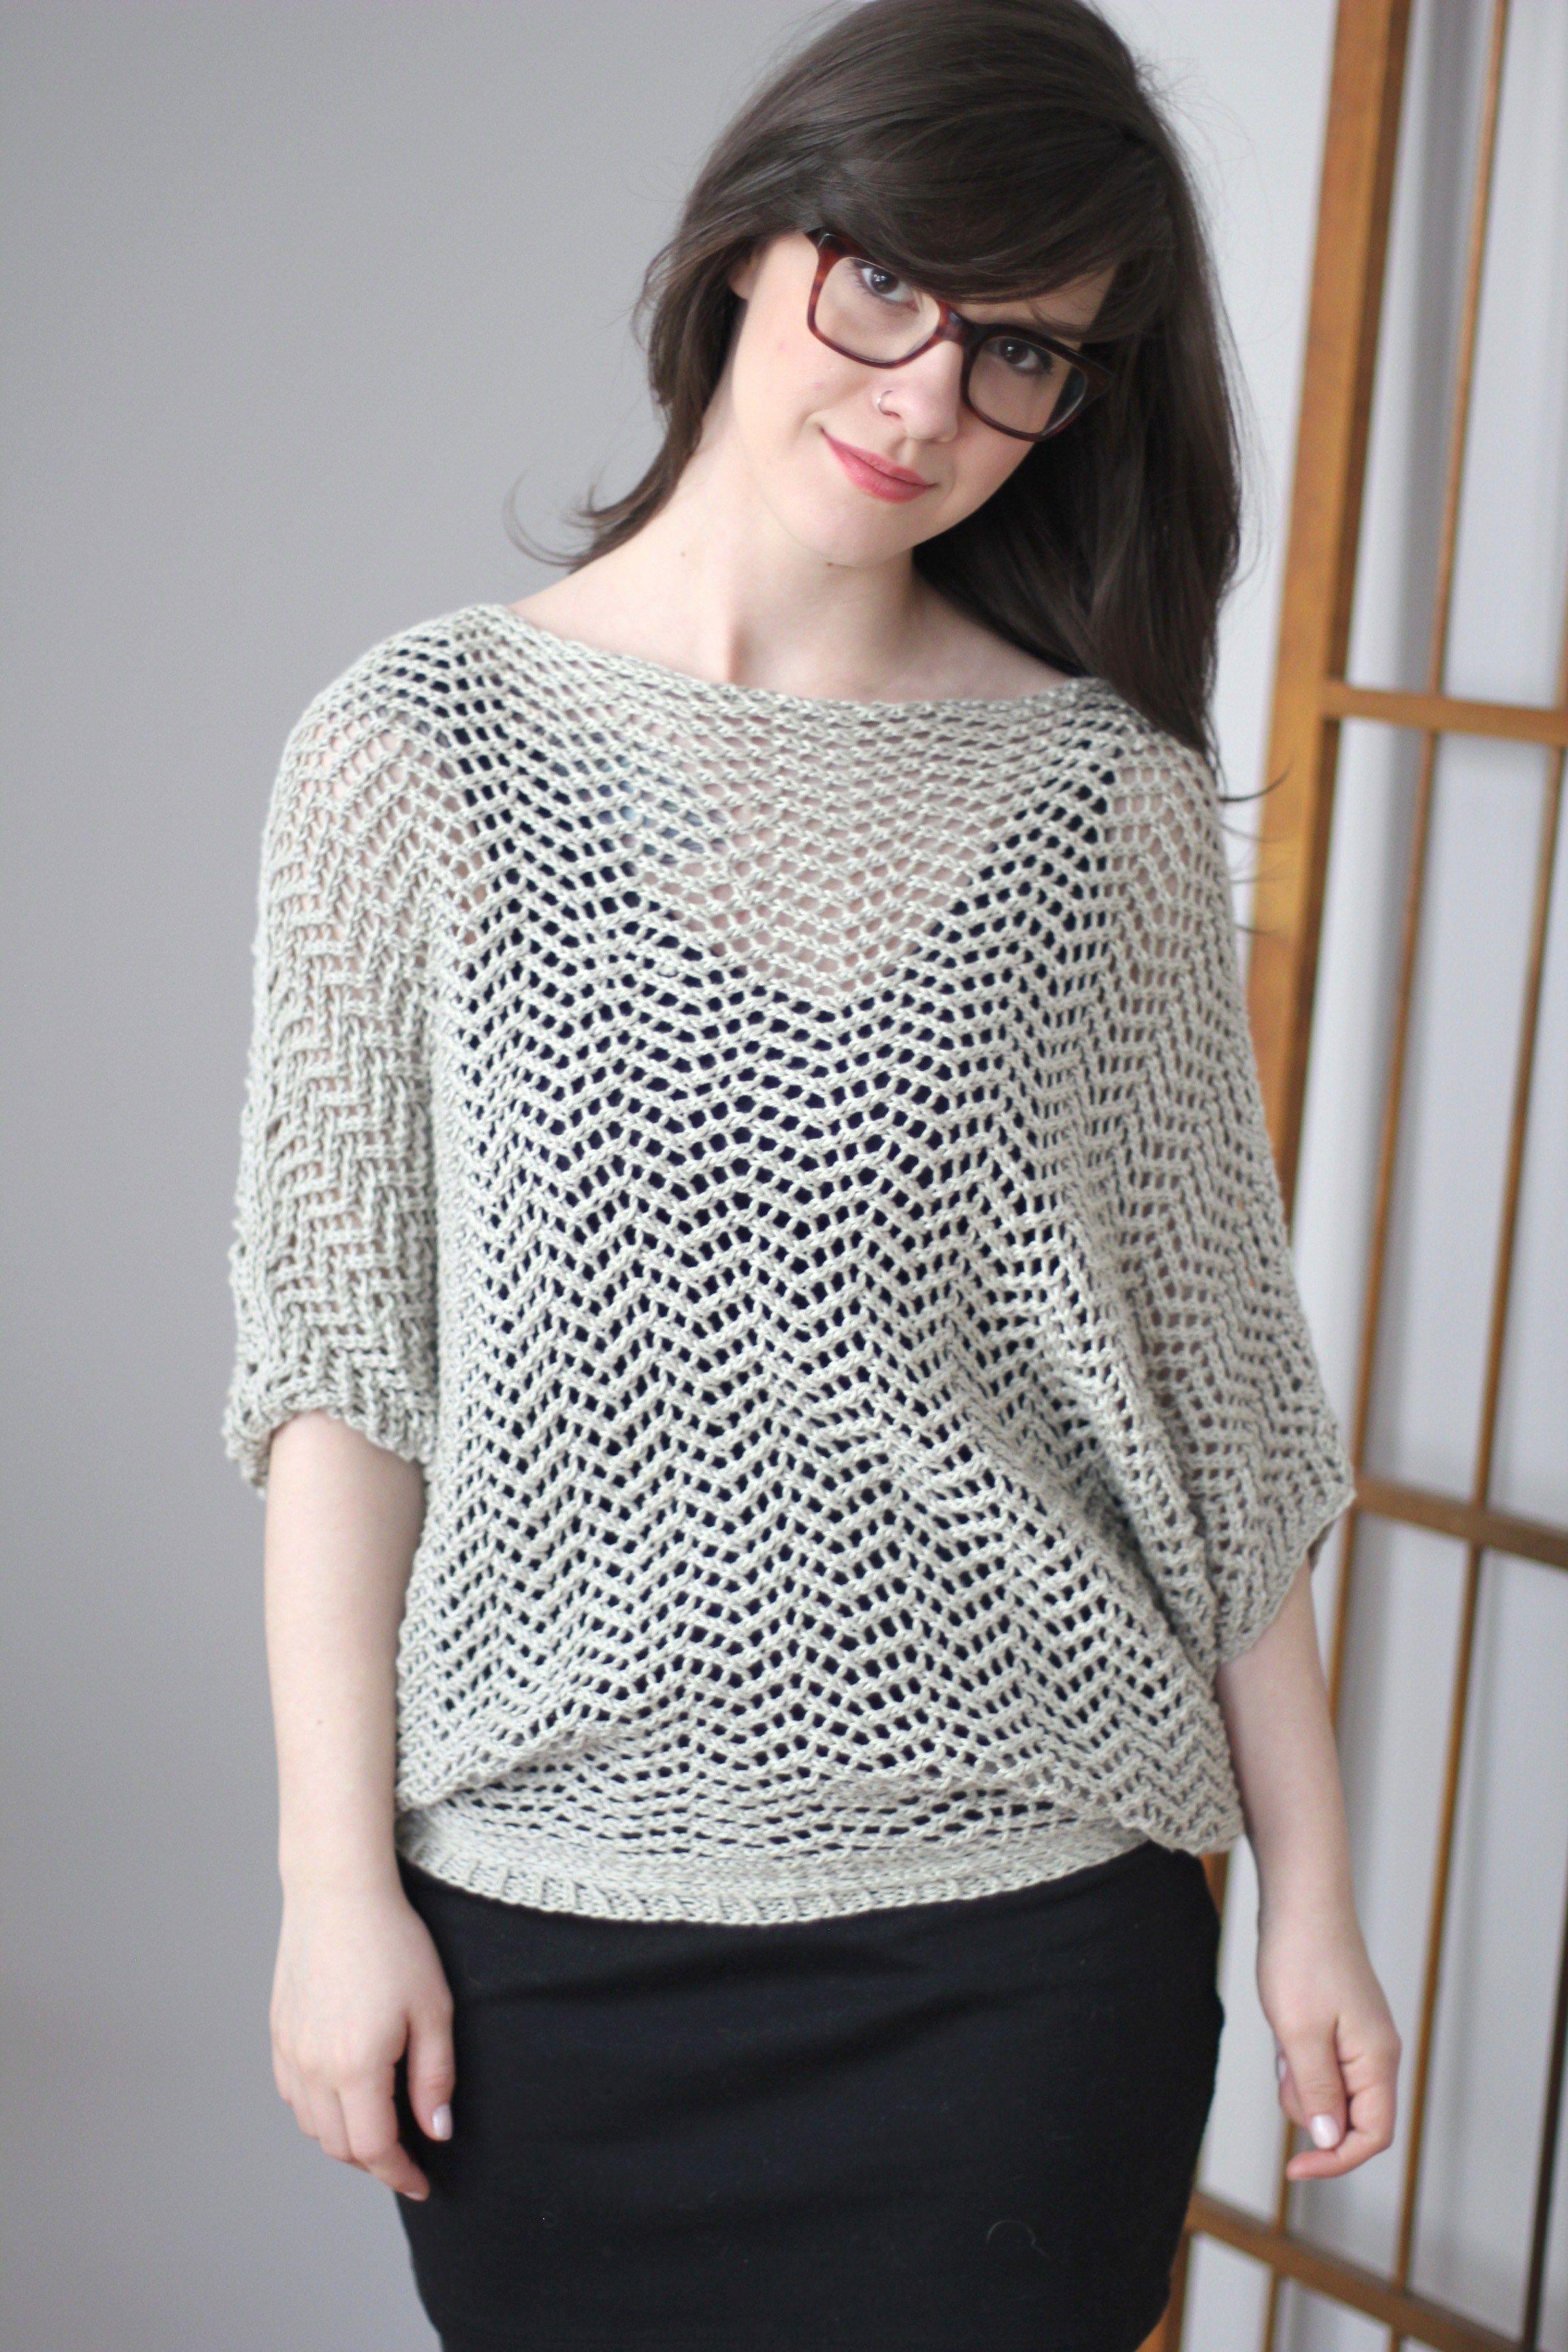 Lady Bat Pattern - Knitting Patterns and Crochet Patterns from ...